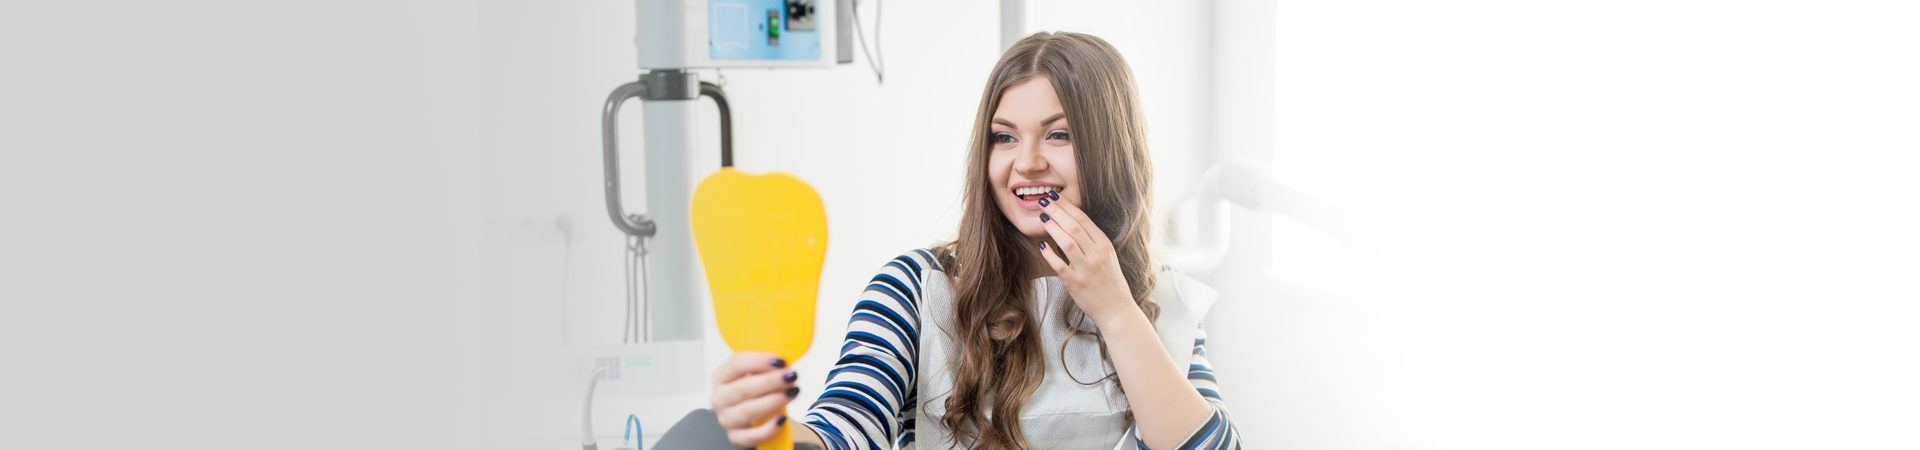 Do You Really Need Wisdom Teeth Extraction